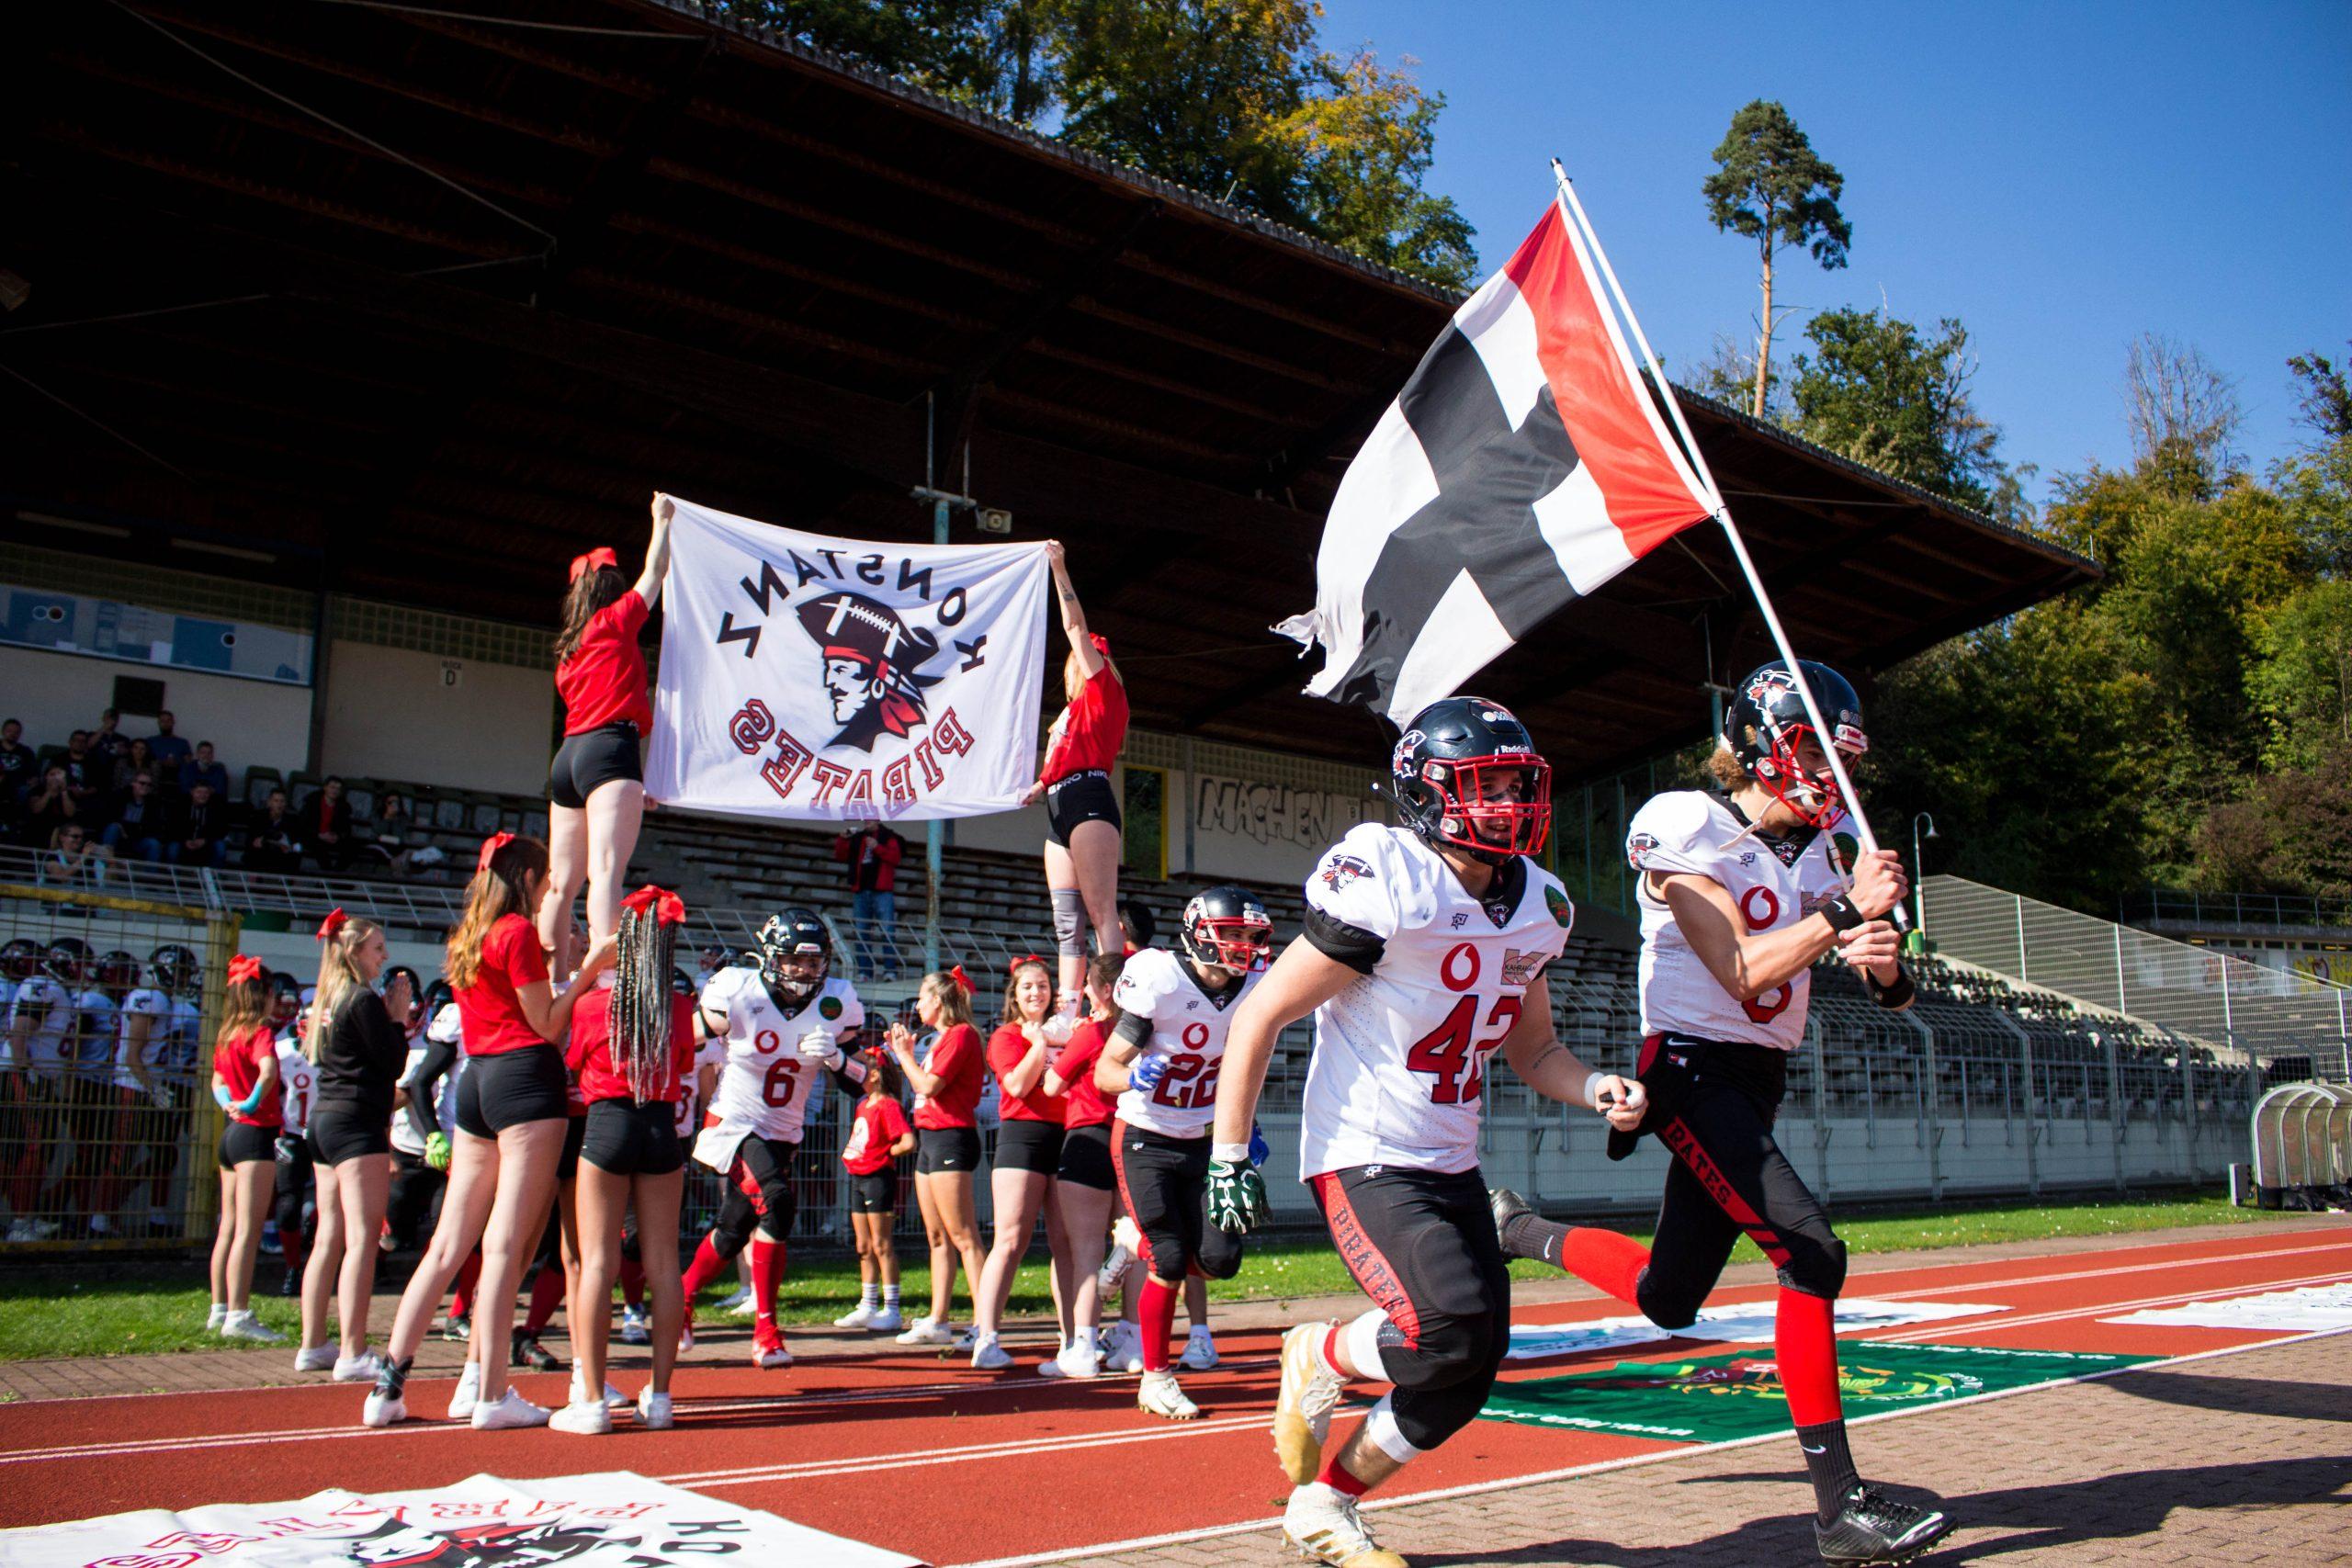 Konstanz Pirates - American Football - Kuchen I